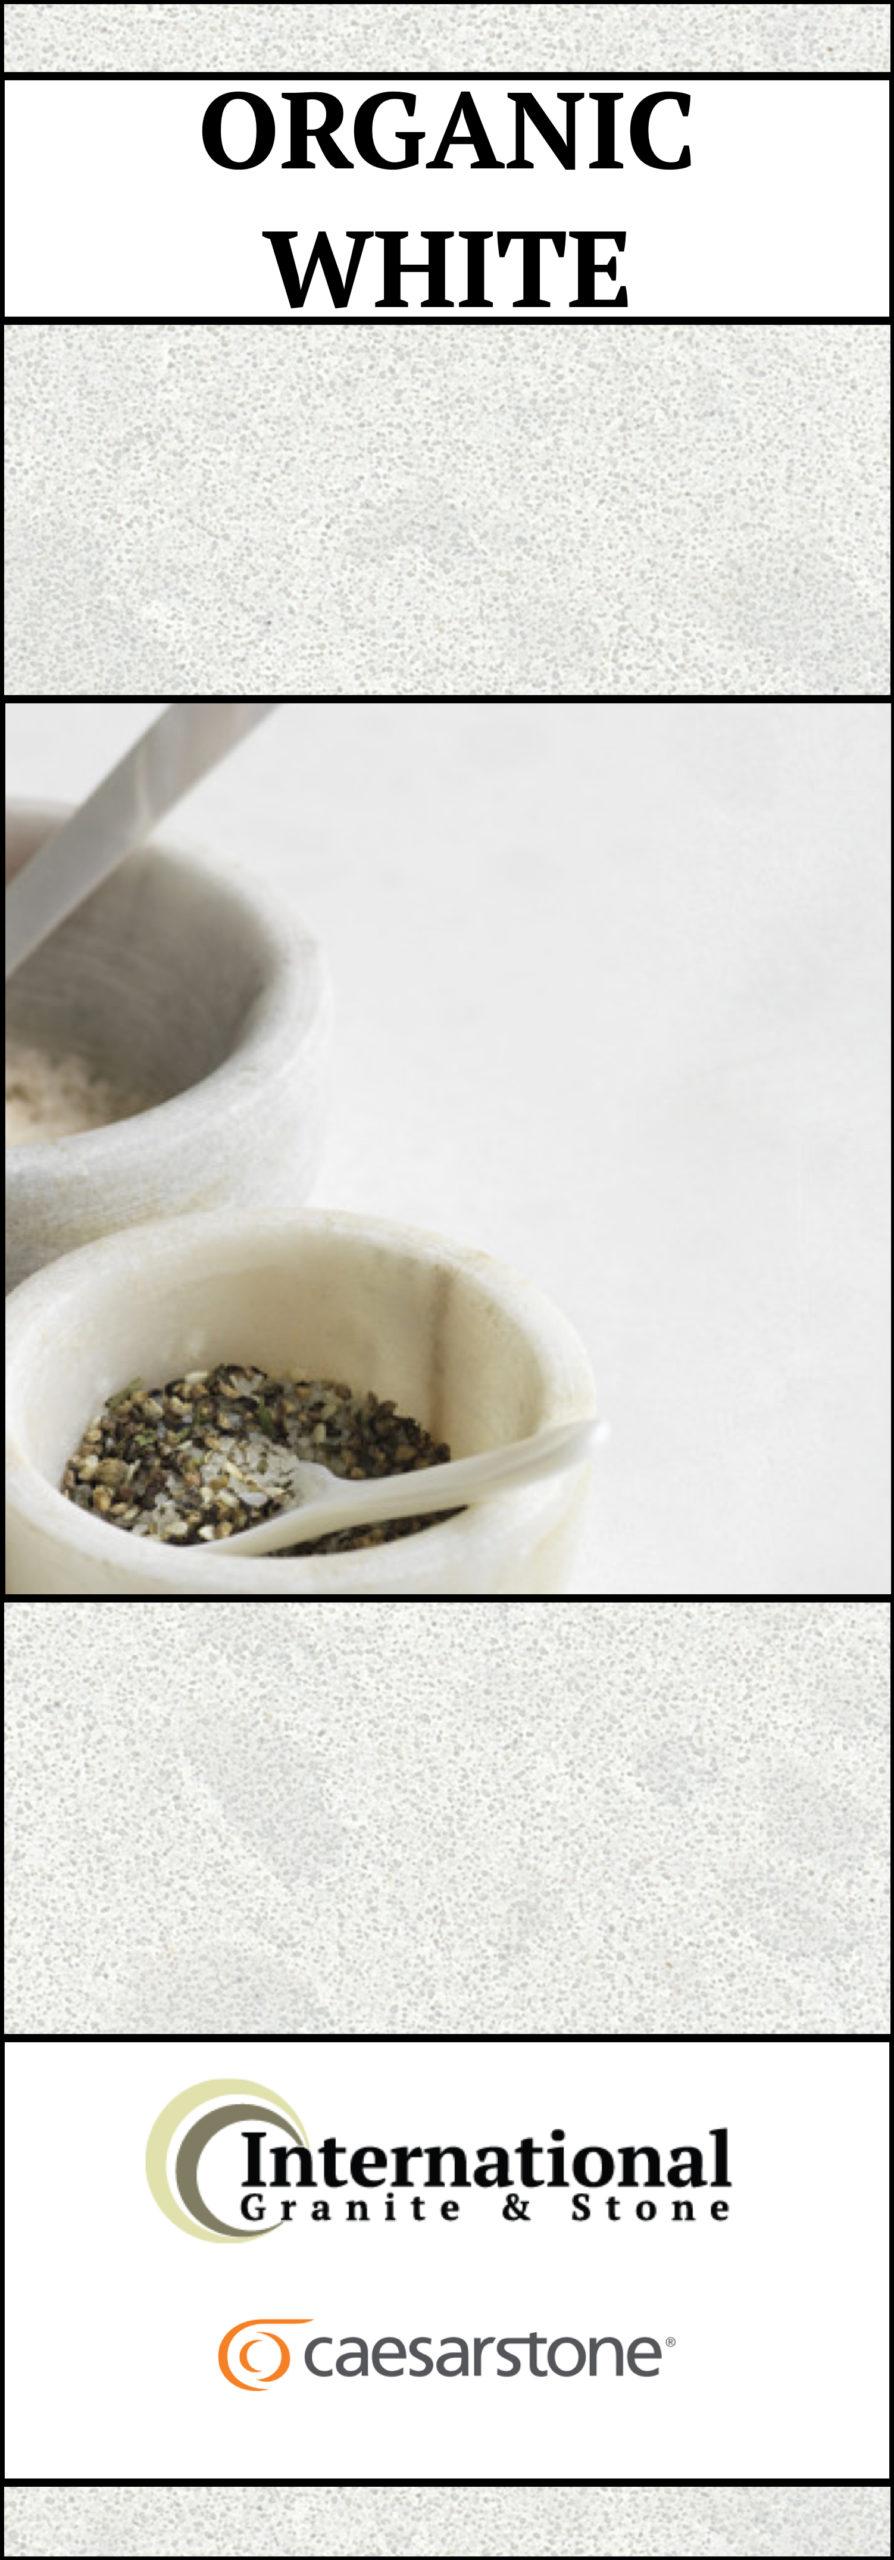 Organic White Caesarstone Quartz Full Slab Pinterest